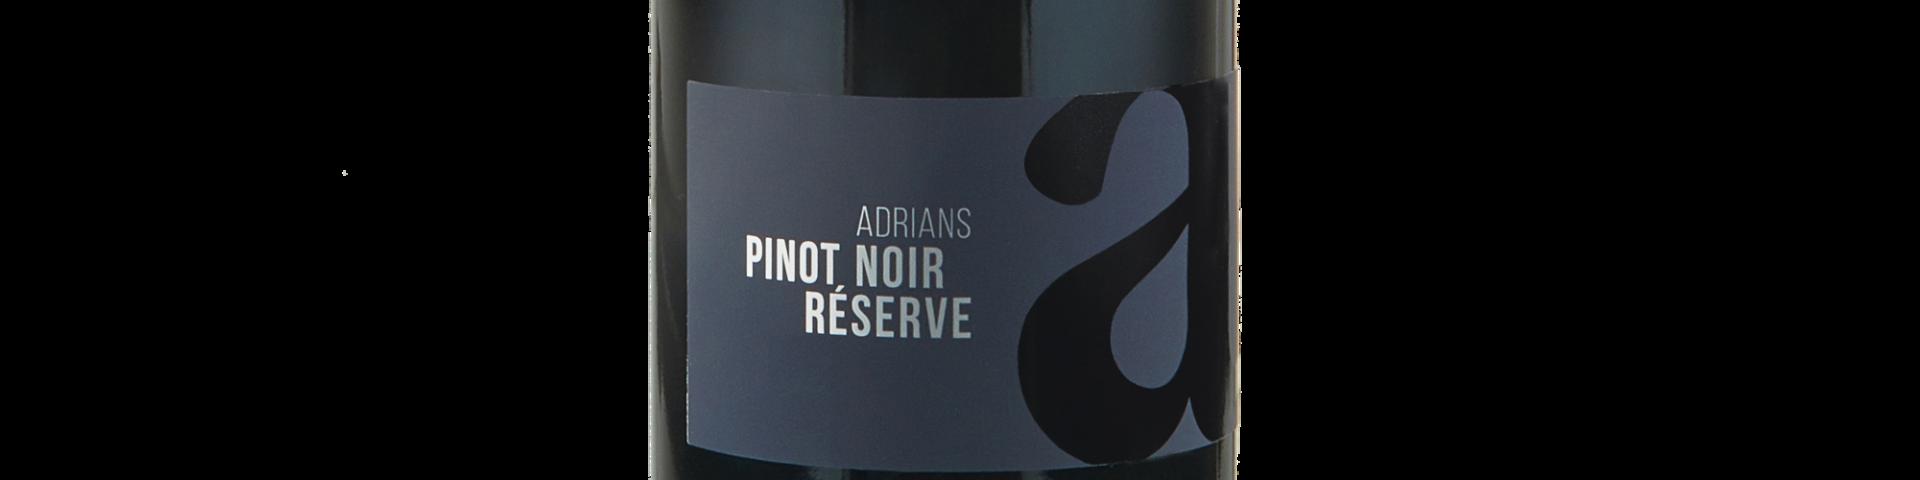 Pinot Noir Adrians Weingut